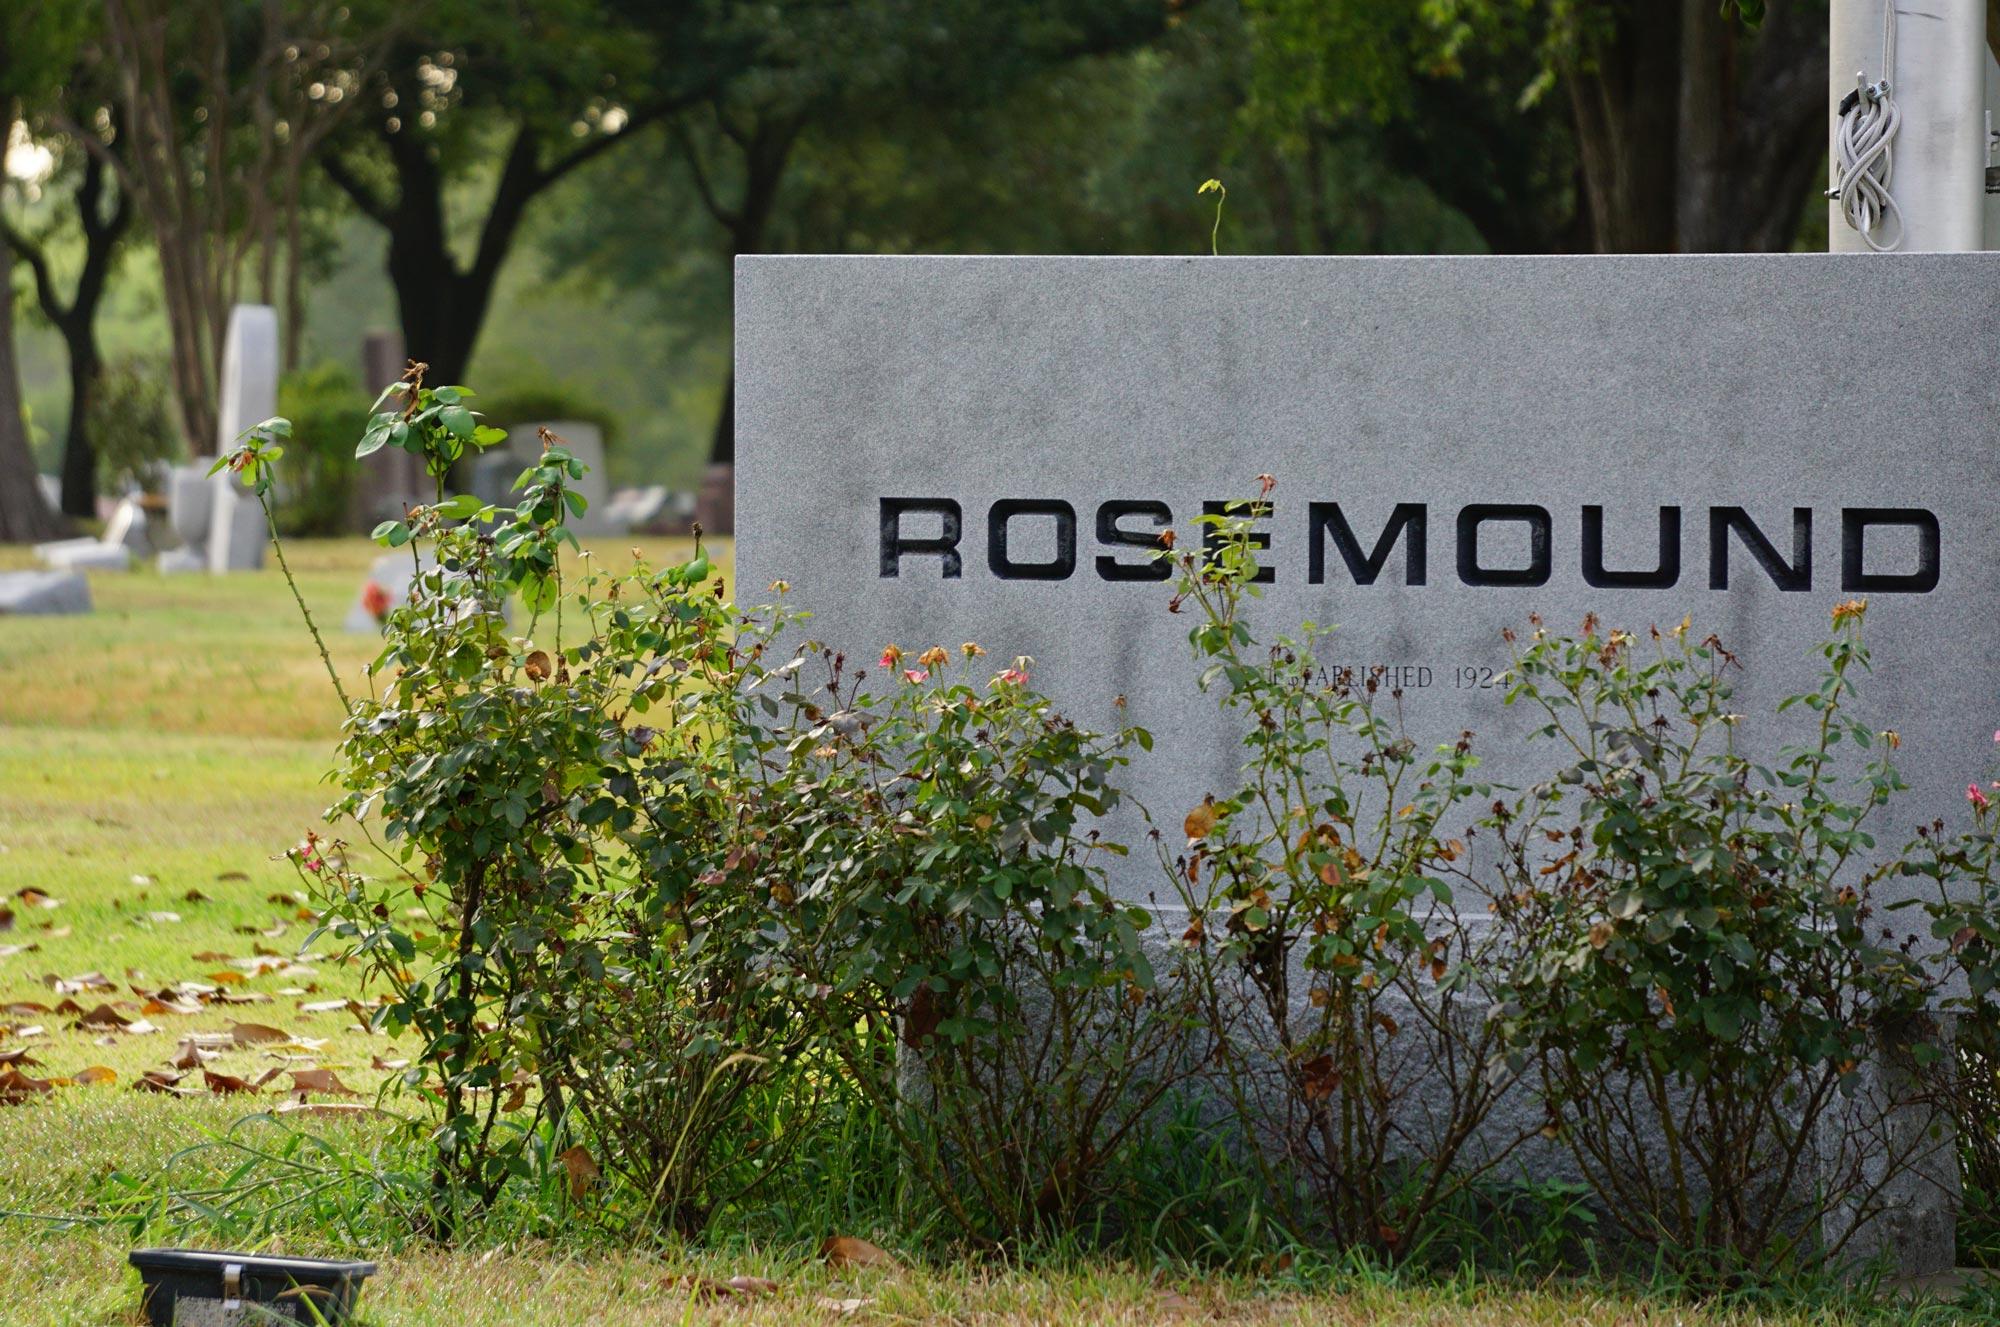 Rosemound Cemetery - background image